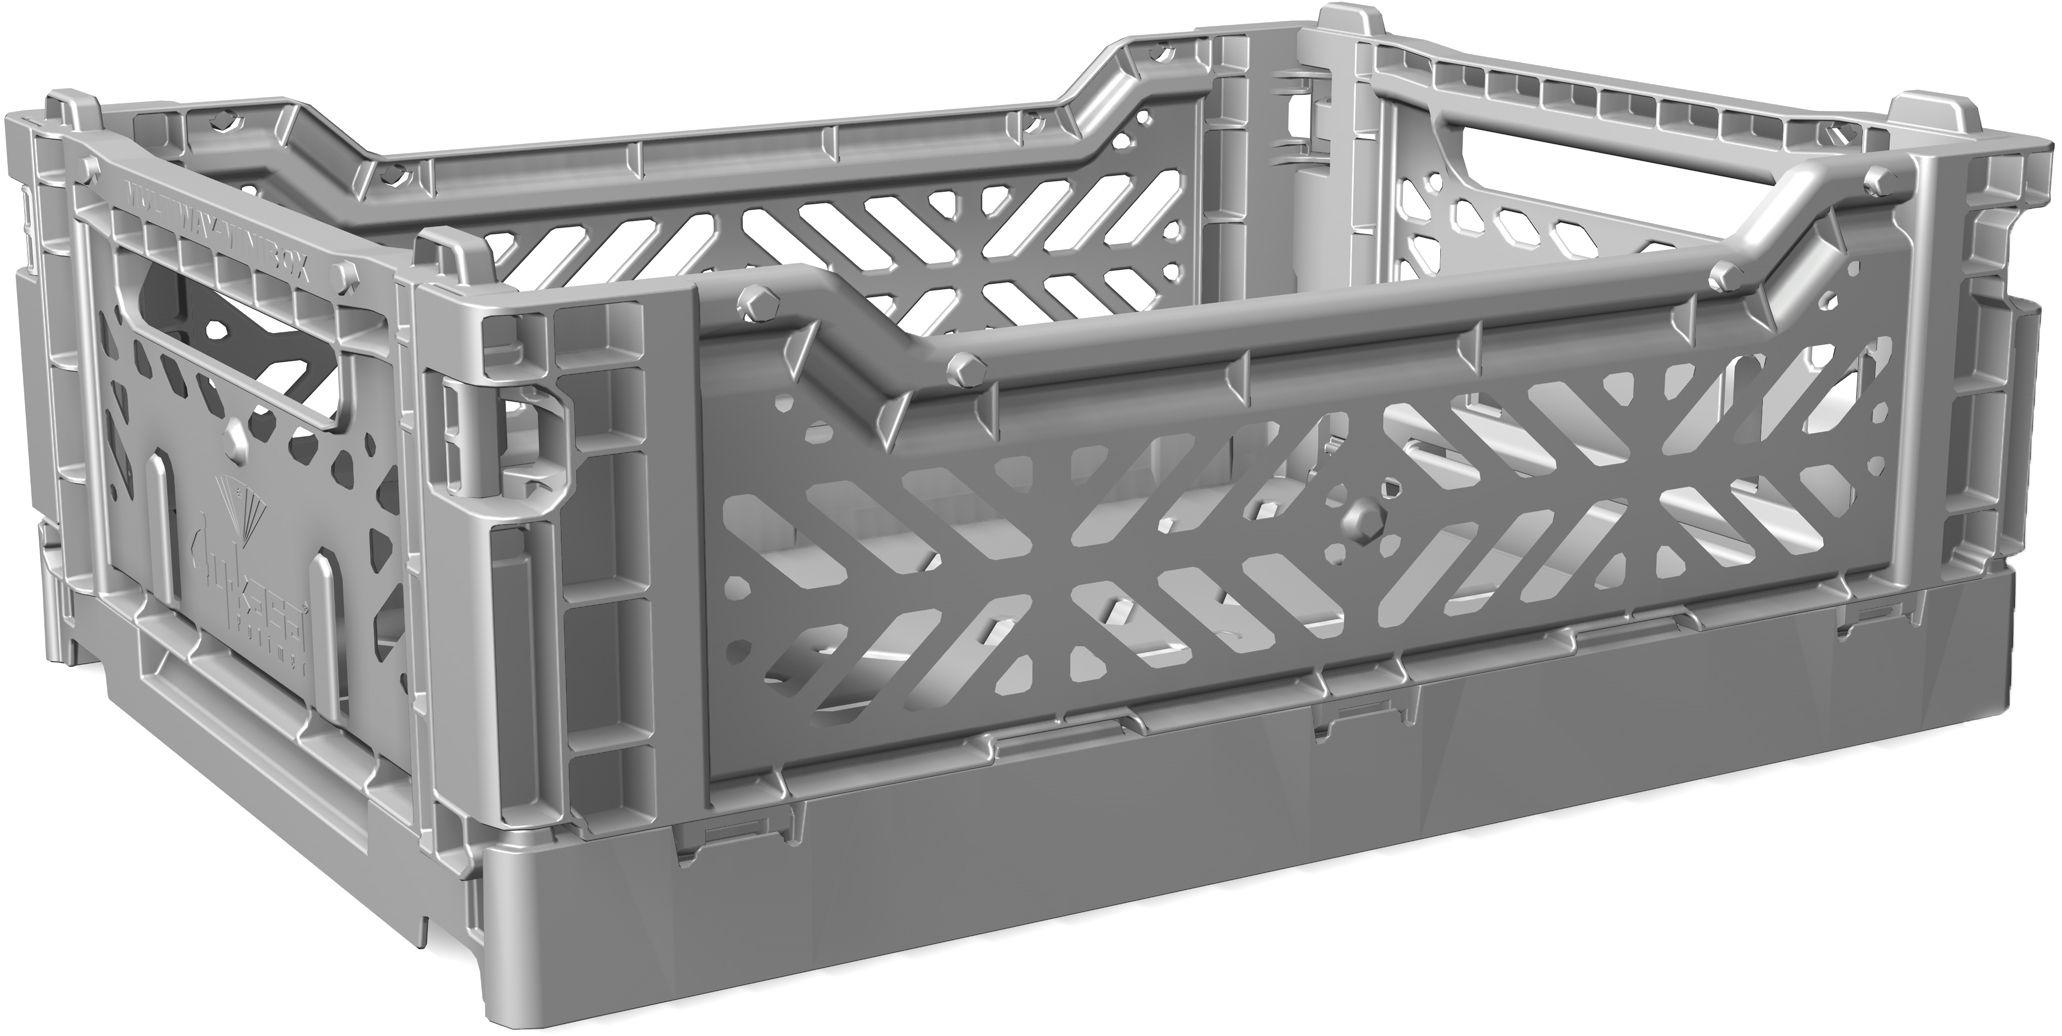 midi box storage rack foldable l 40 cm grey by surplus systems pop corn. Black Bedroom Furniture Sets. Home Design Ideas